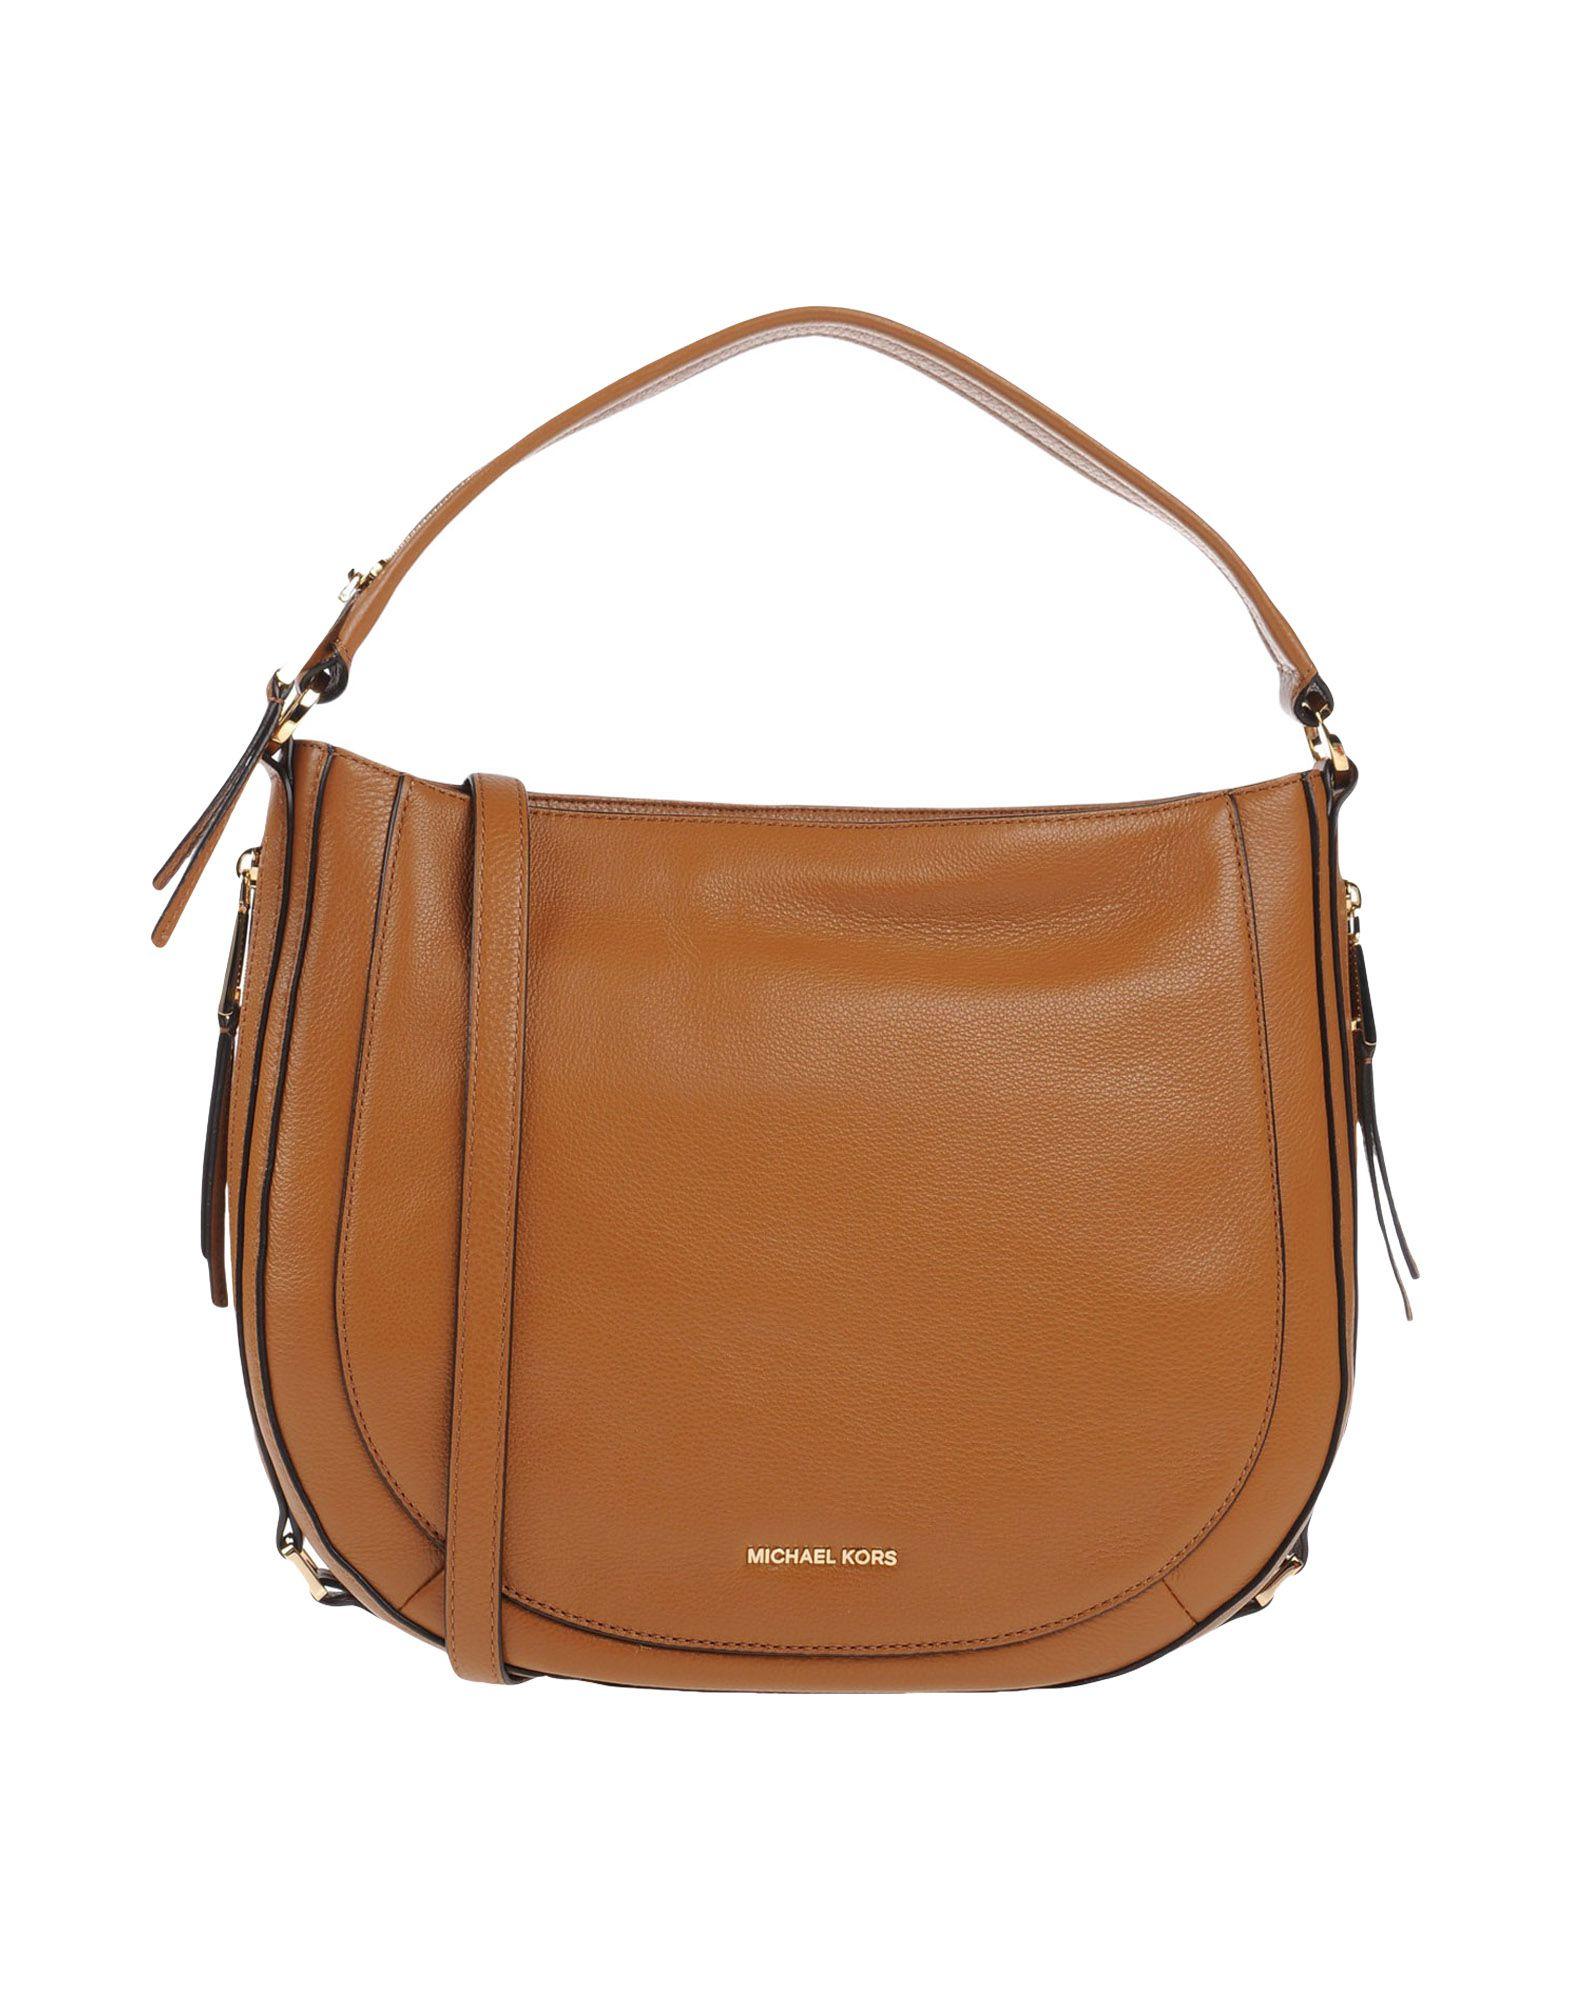 Michael Kors Selma Medium Tz Satchel Python Embossed Leather Natural Lilac Authentic Handbags